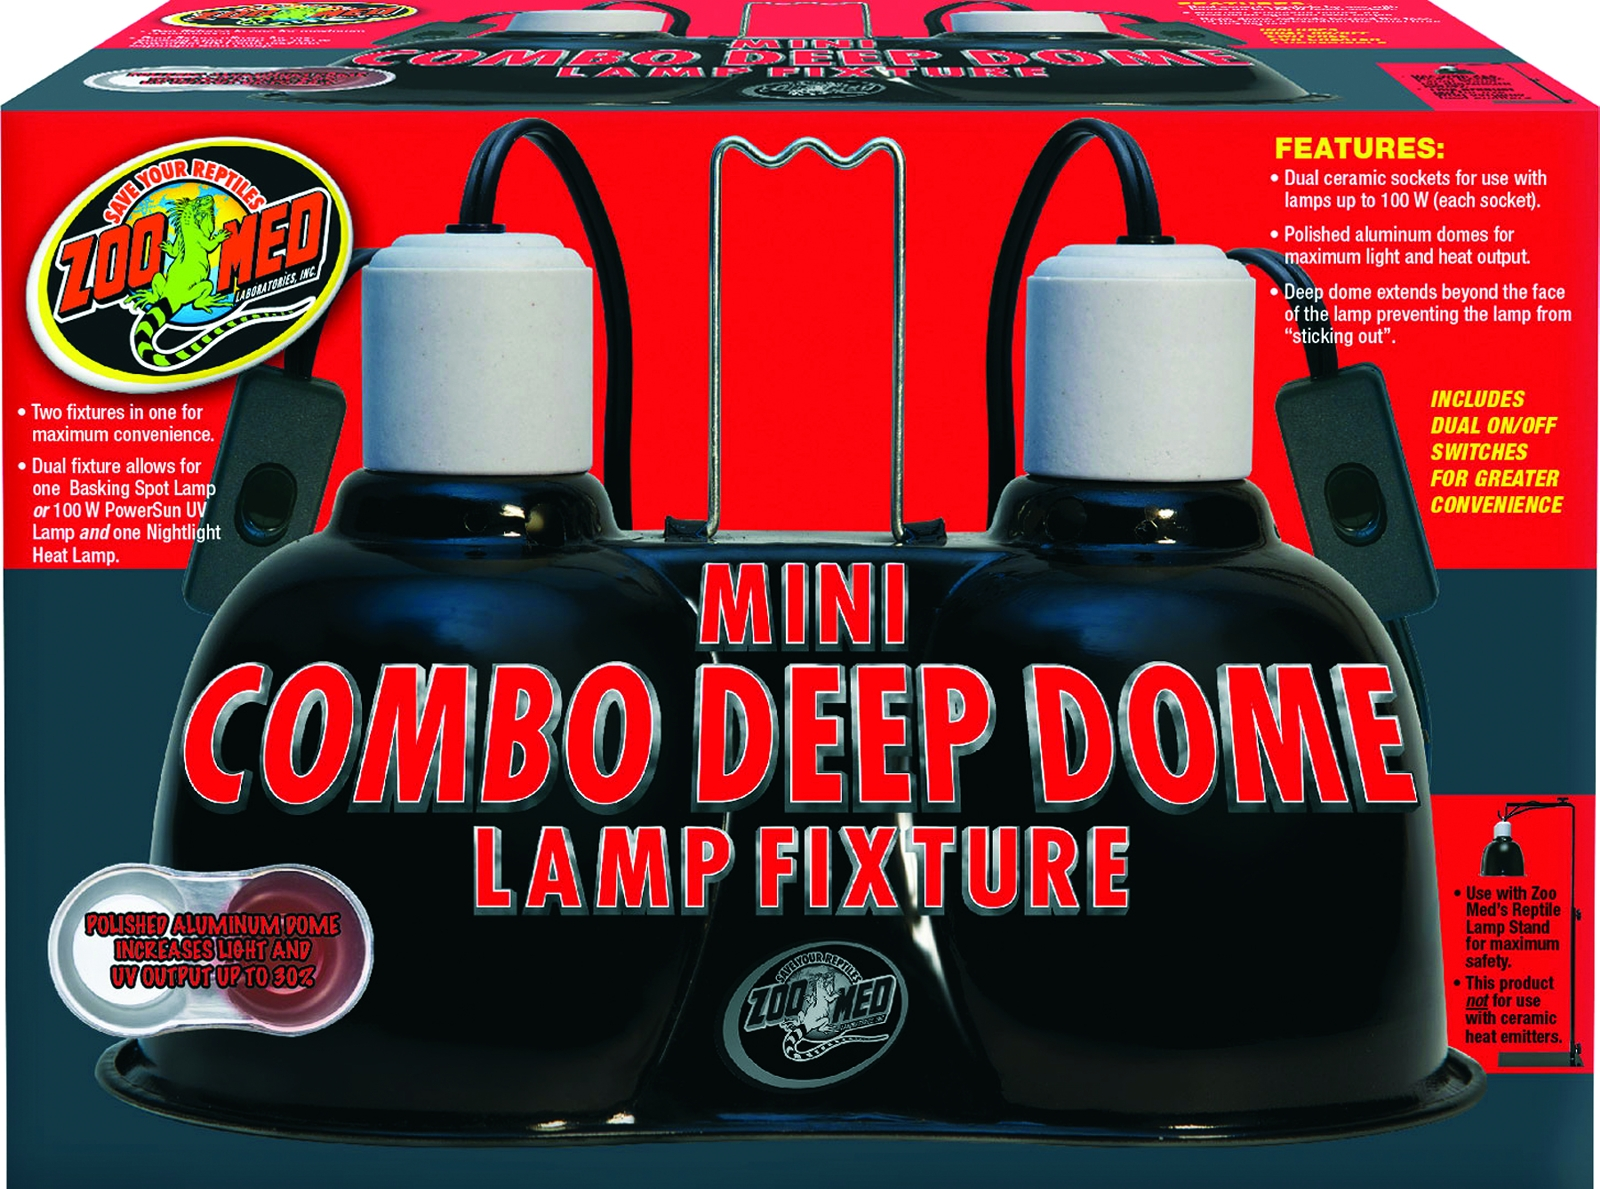 Zoo Med Combo Deep Dome Lamp